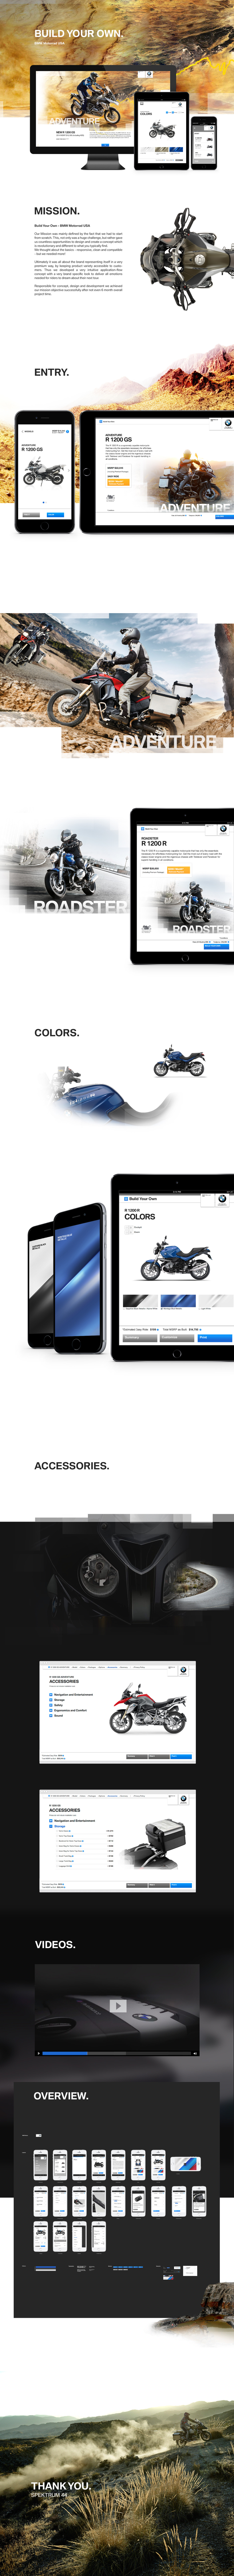 motorrad buildyourown usa BMW Spektrum44 desktop mobile UI Layout development Web